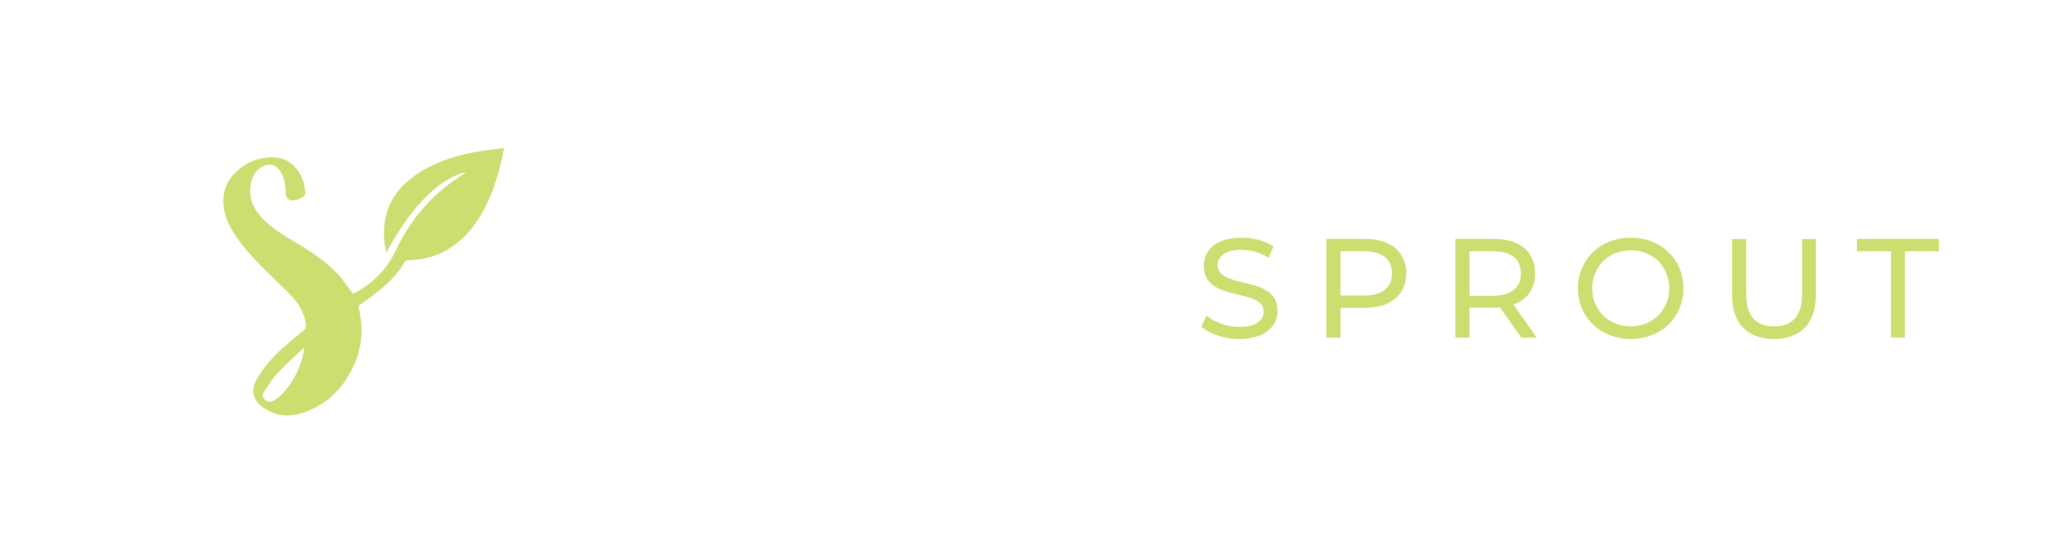 CYBERsprout_logo_reverse_type--04